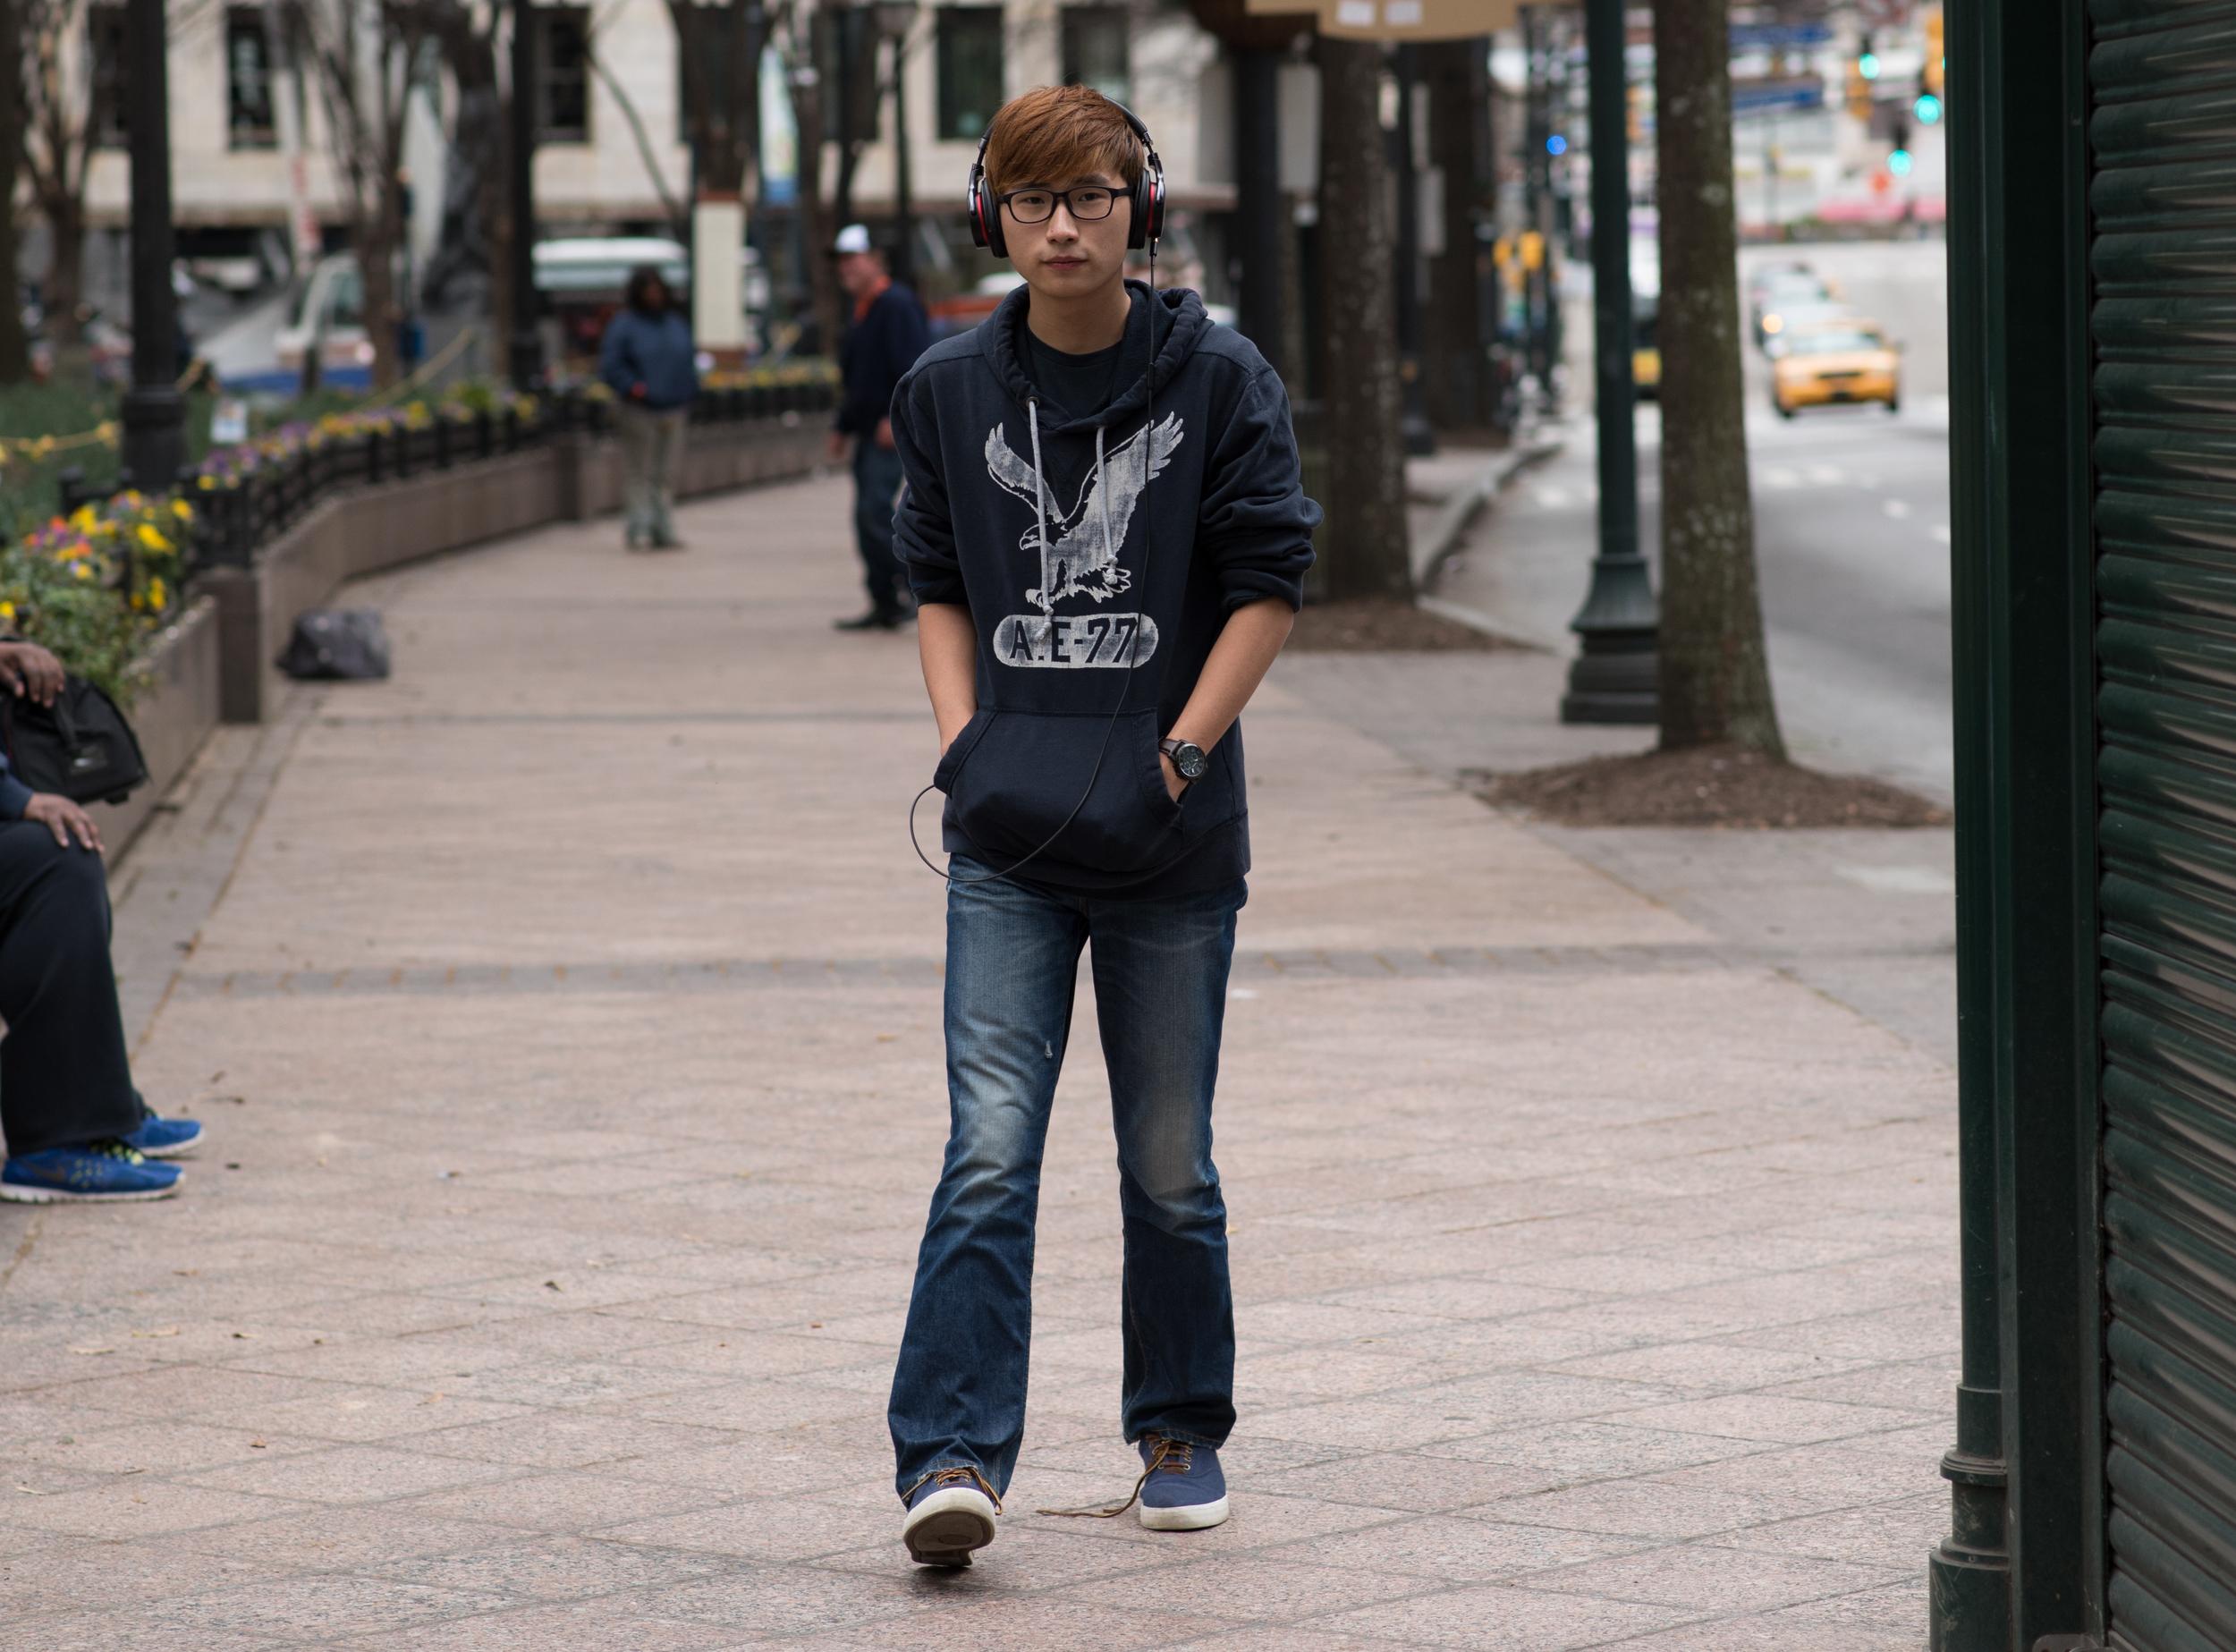 walking-downtown.jpg